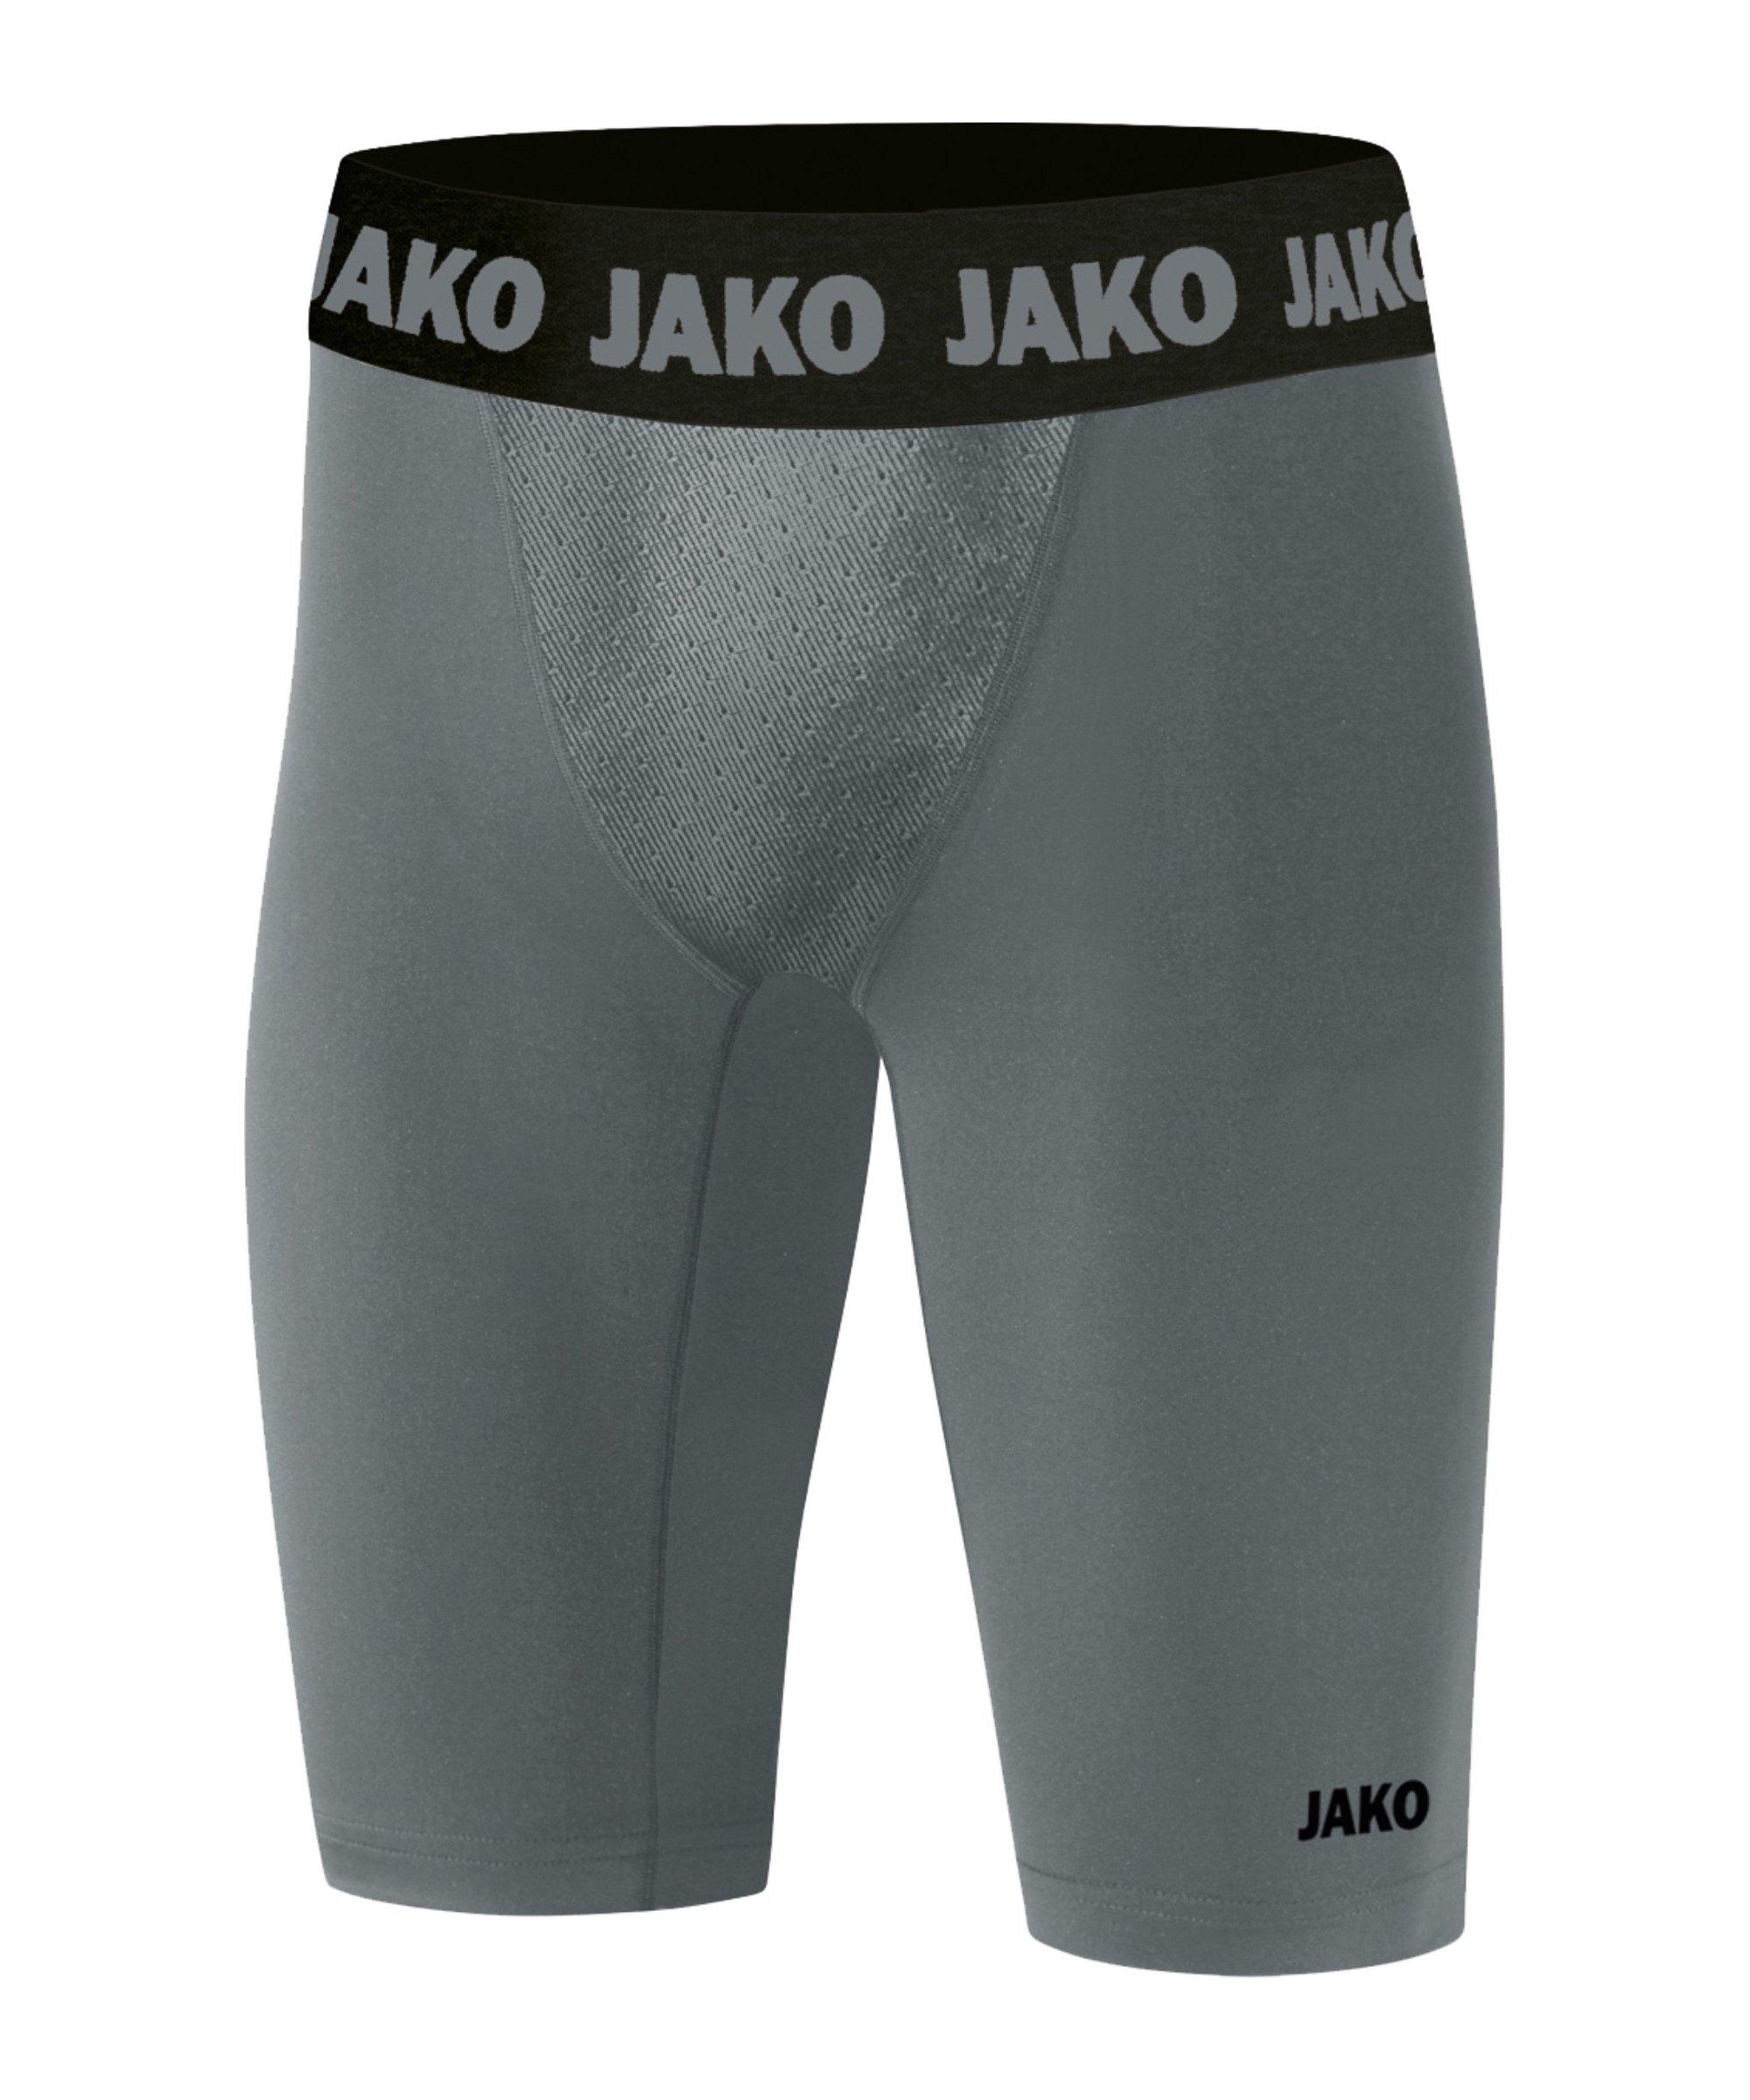 JAKO Compression 2.0 Tight Short Grau F40 - grau